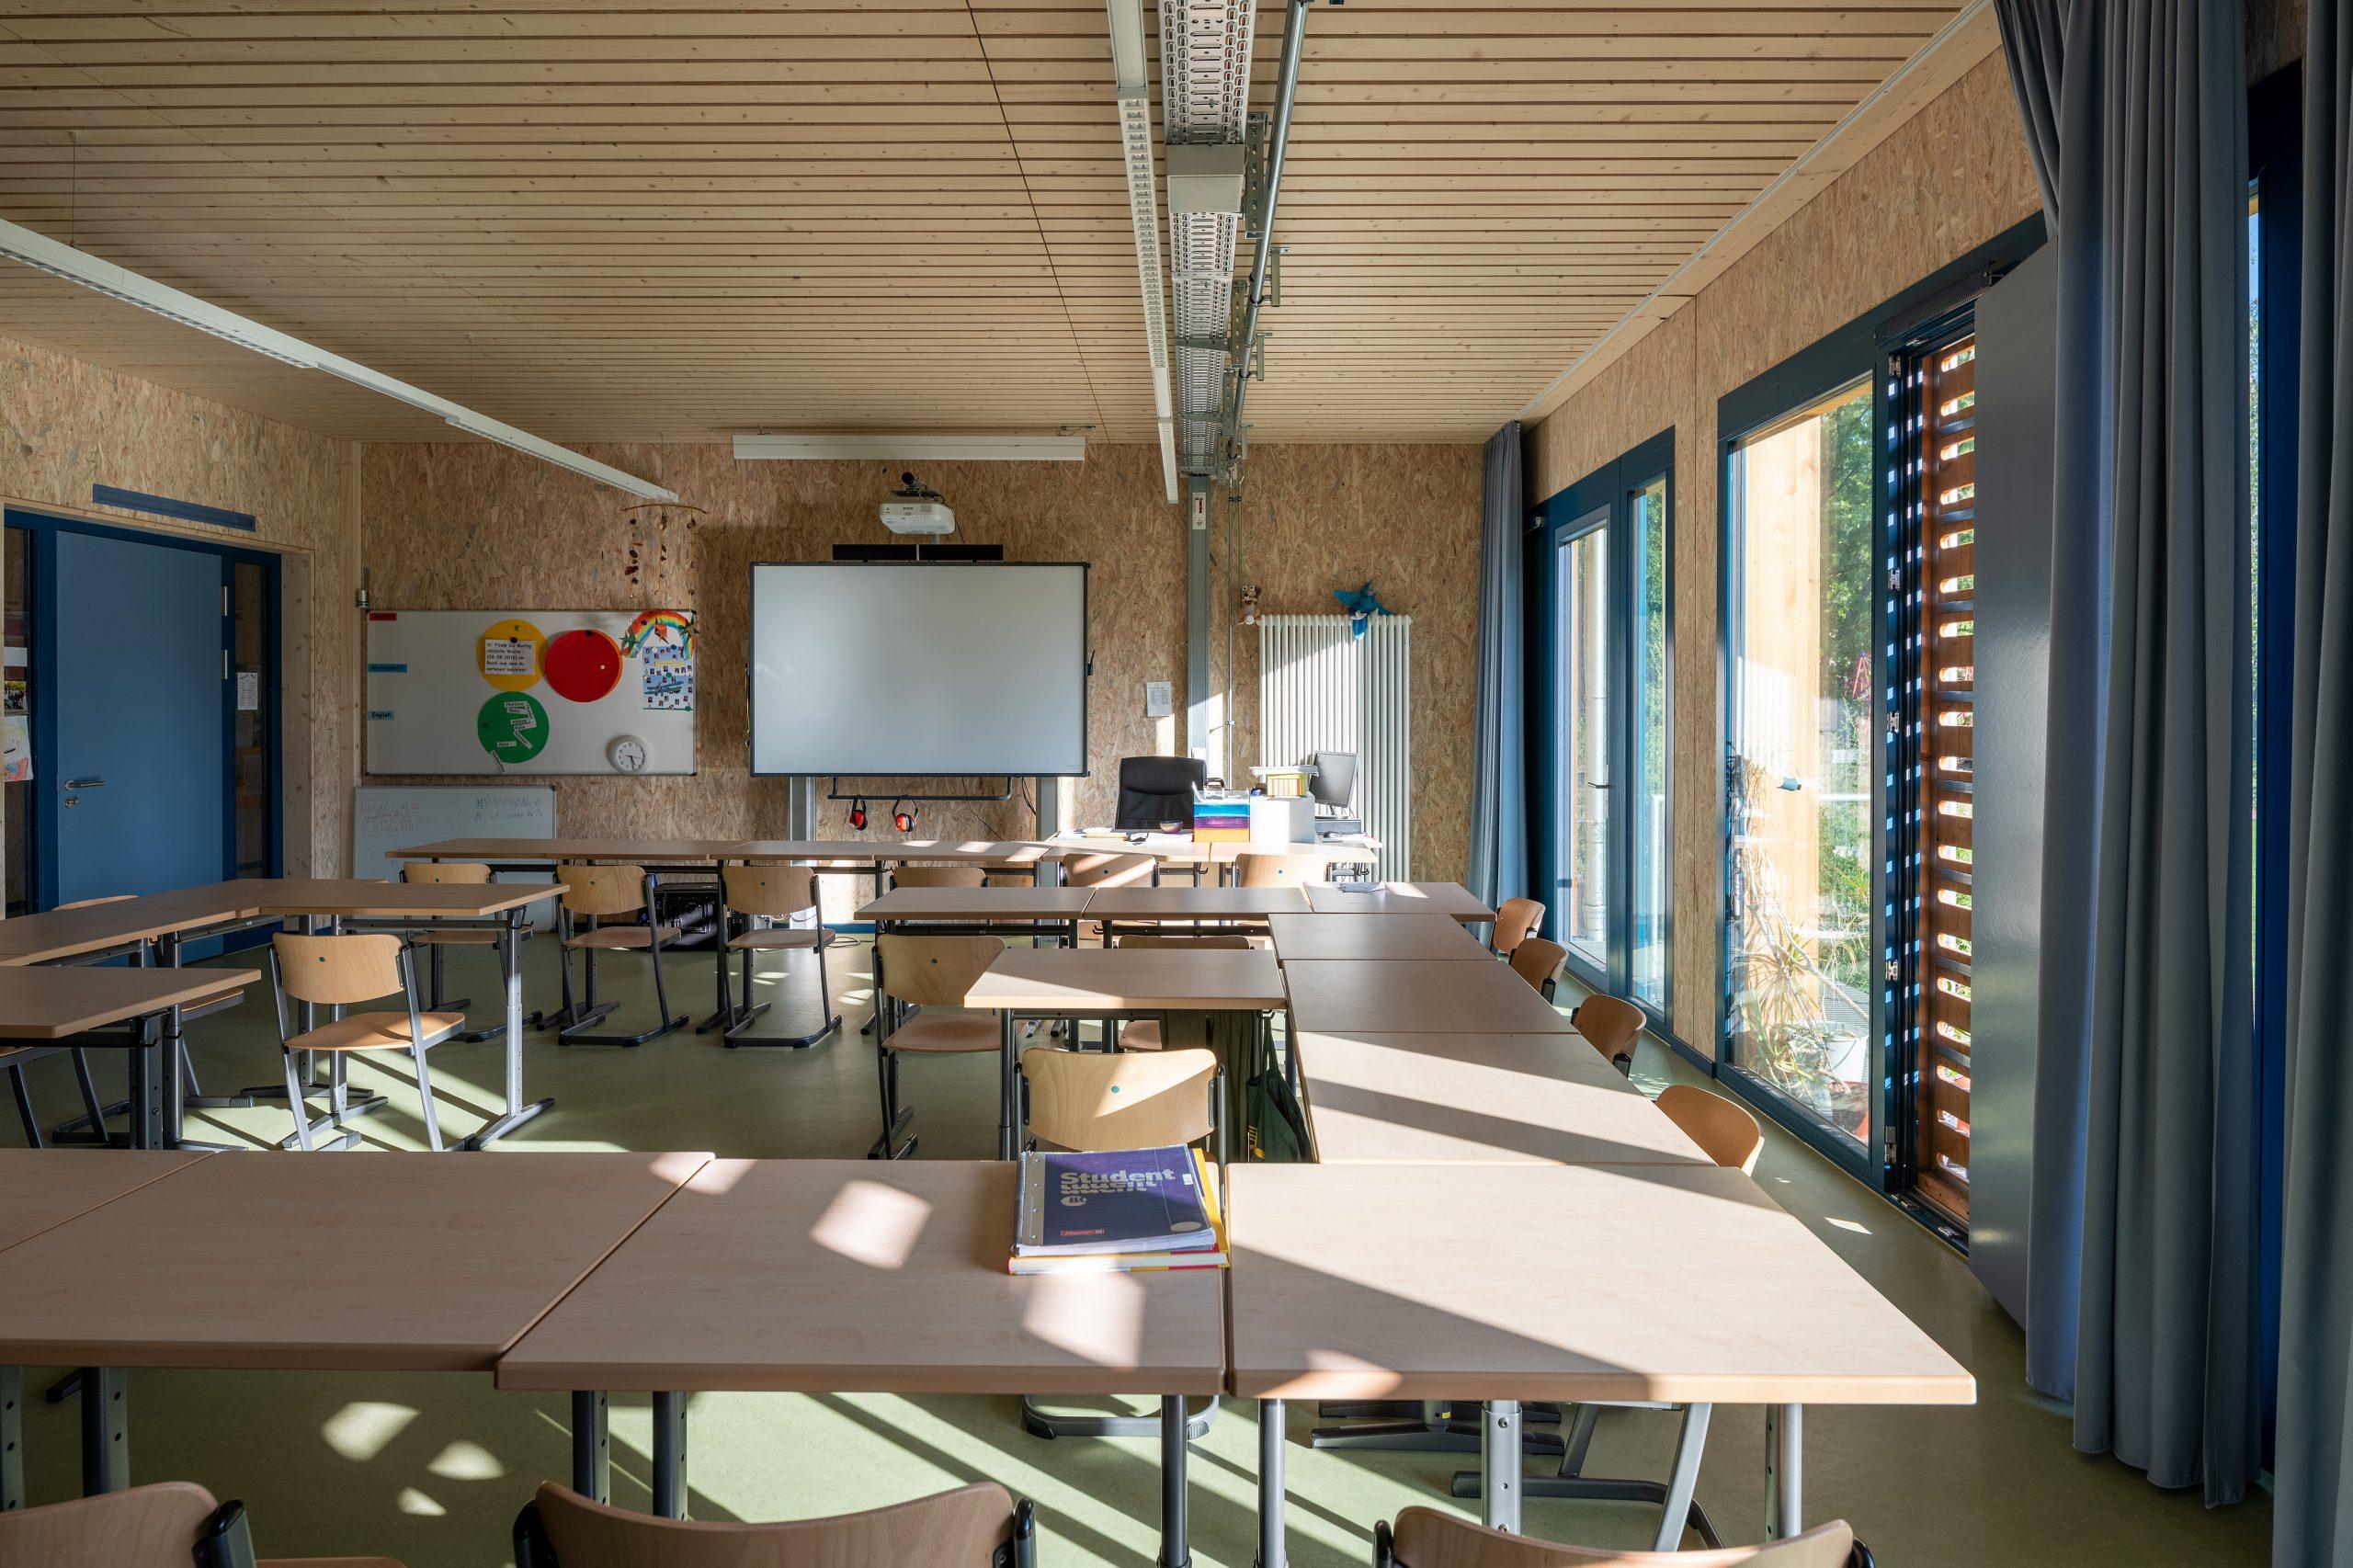 Innenraum Klassenzimmer